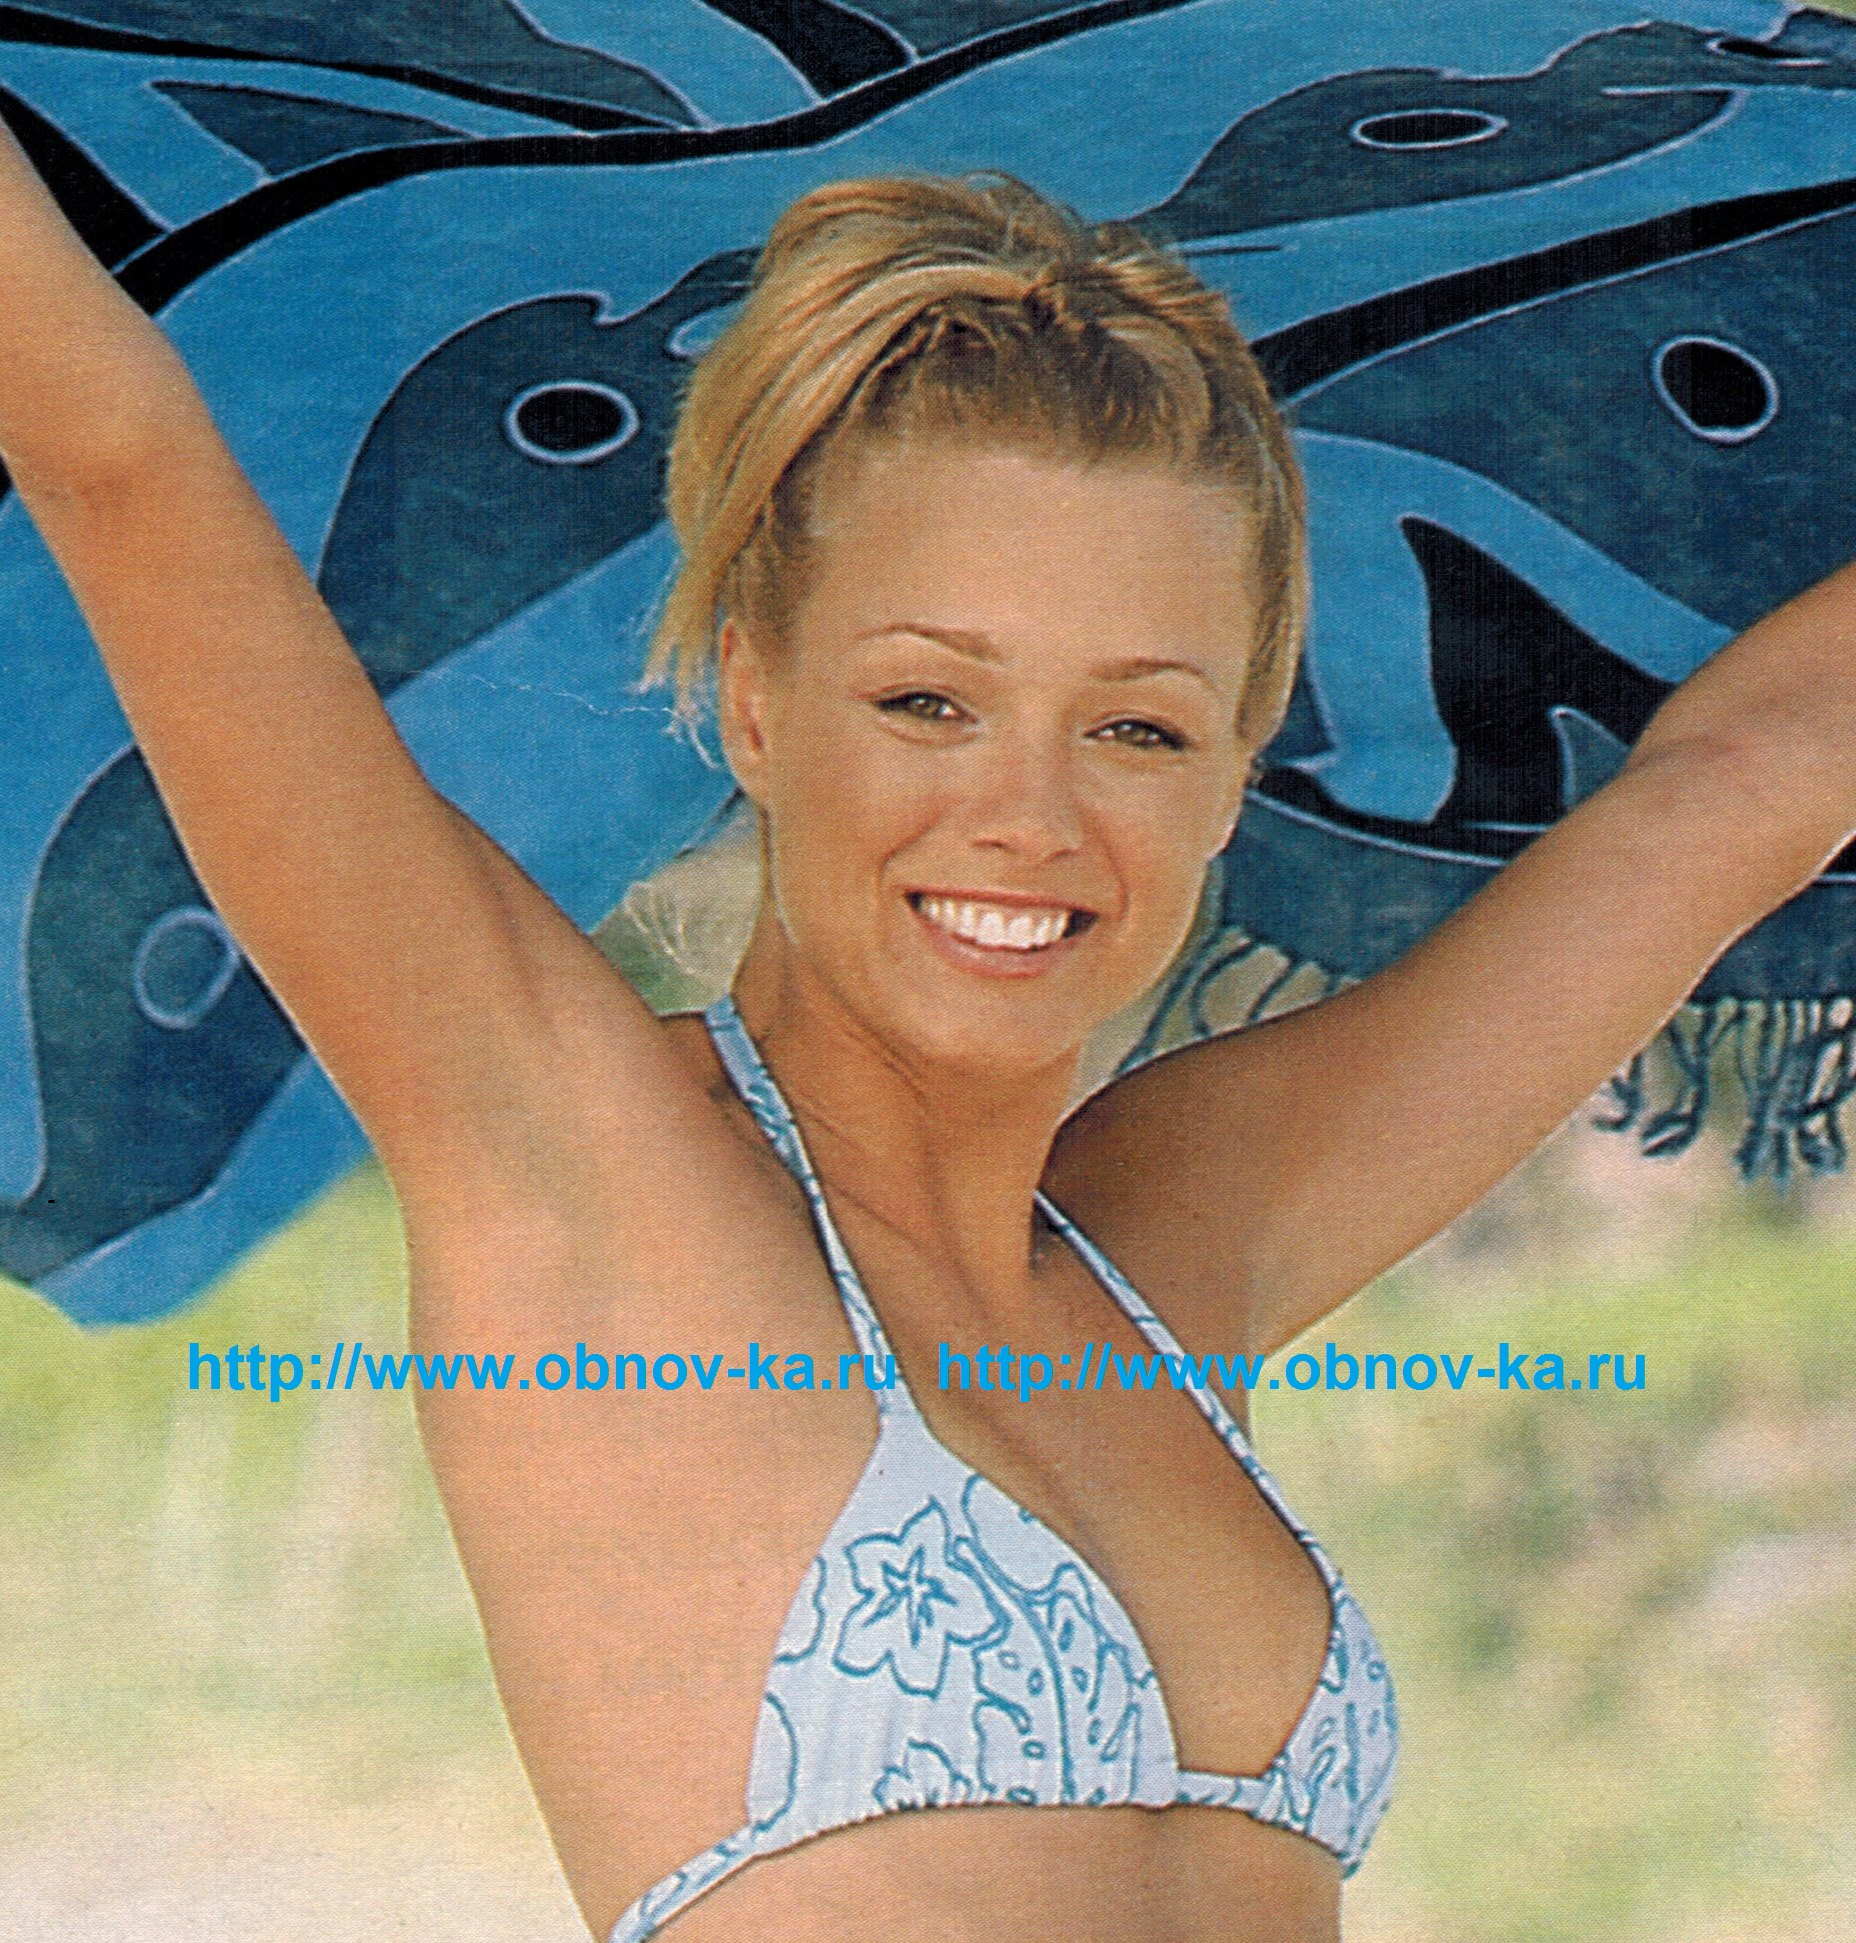 http://obnov-ka.ru/wp-content/uploads/2013/06/Dif-bikini-c.jpg